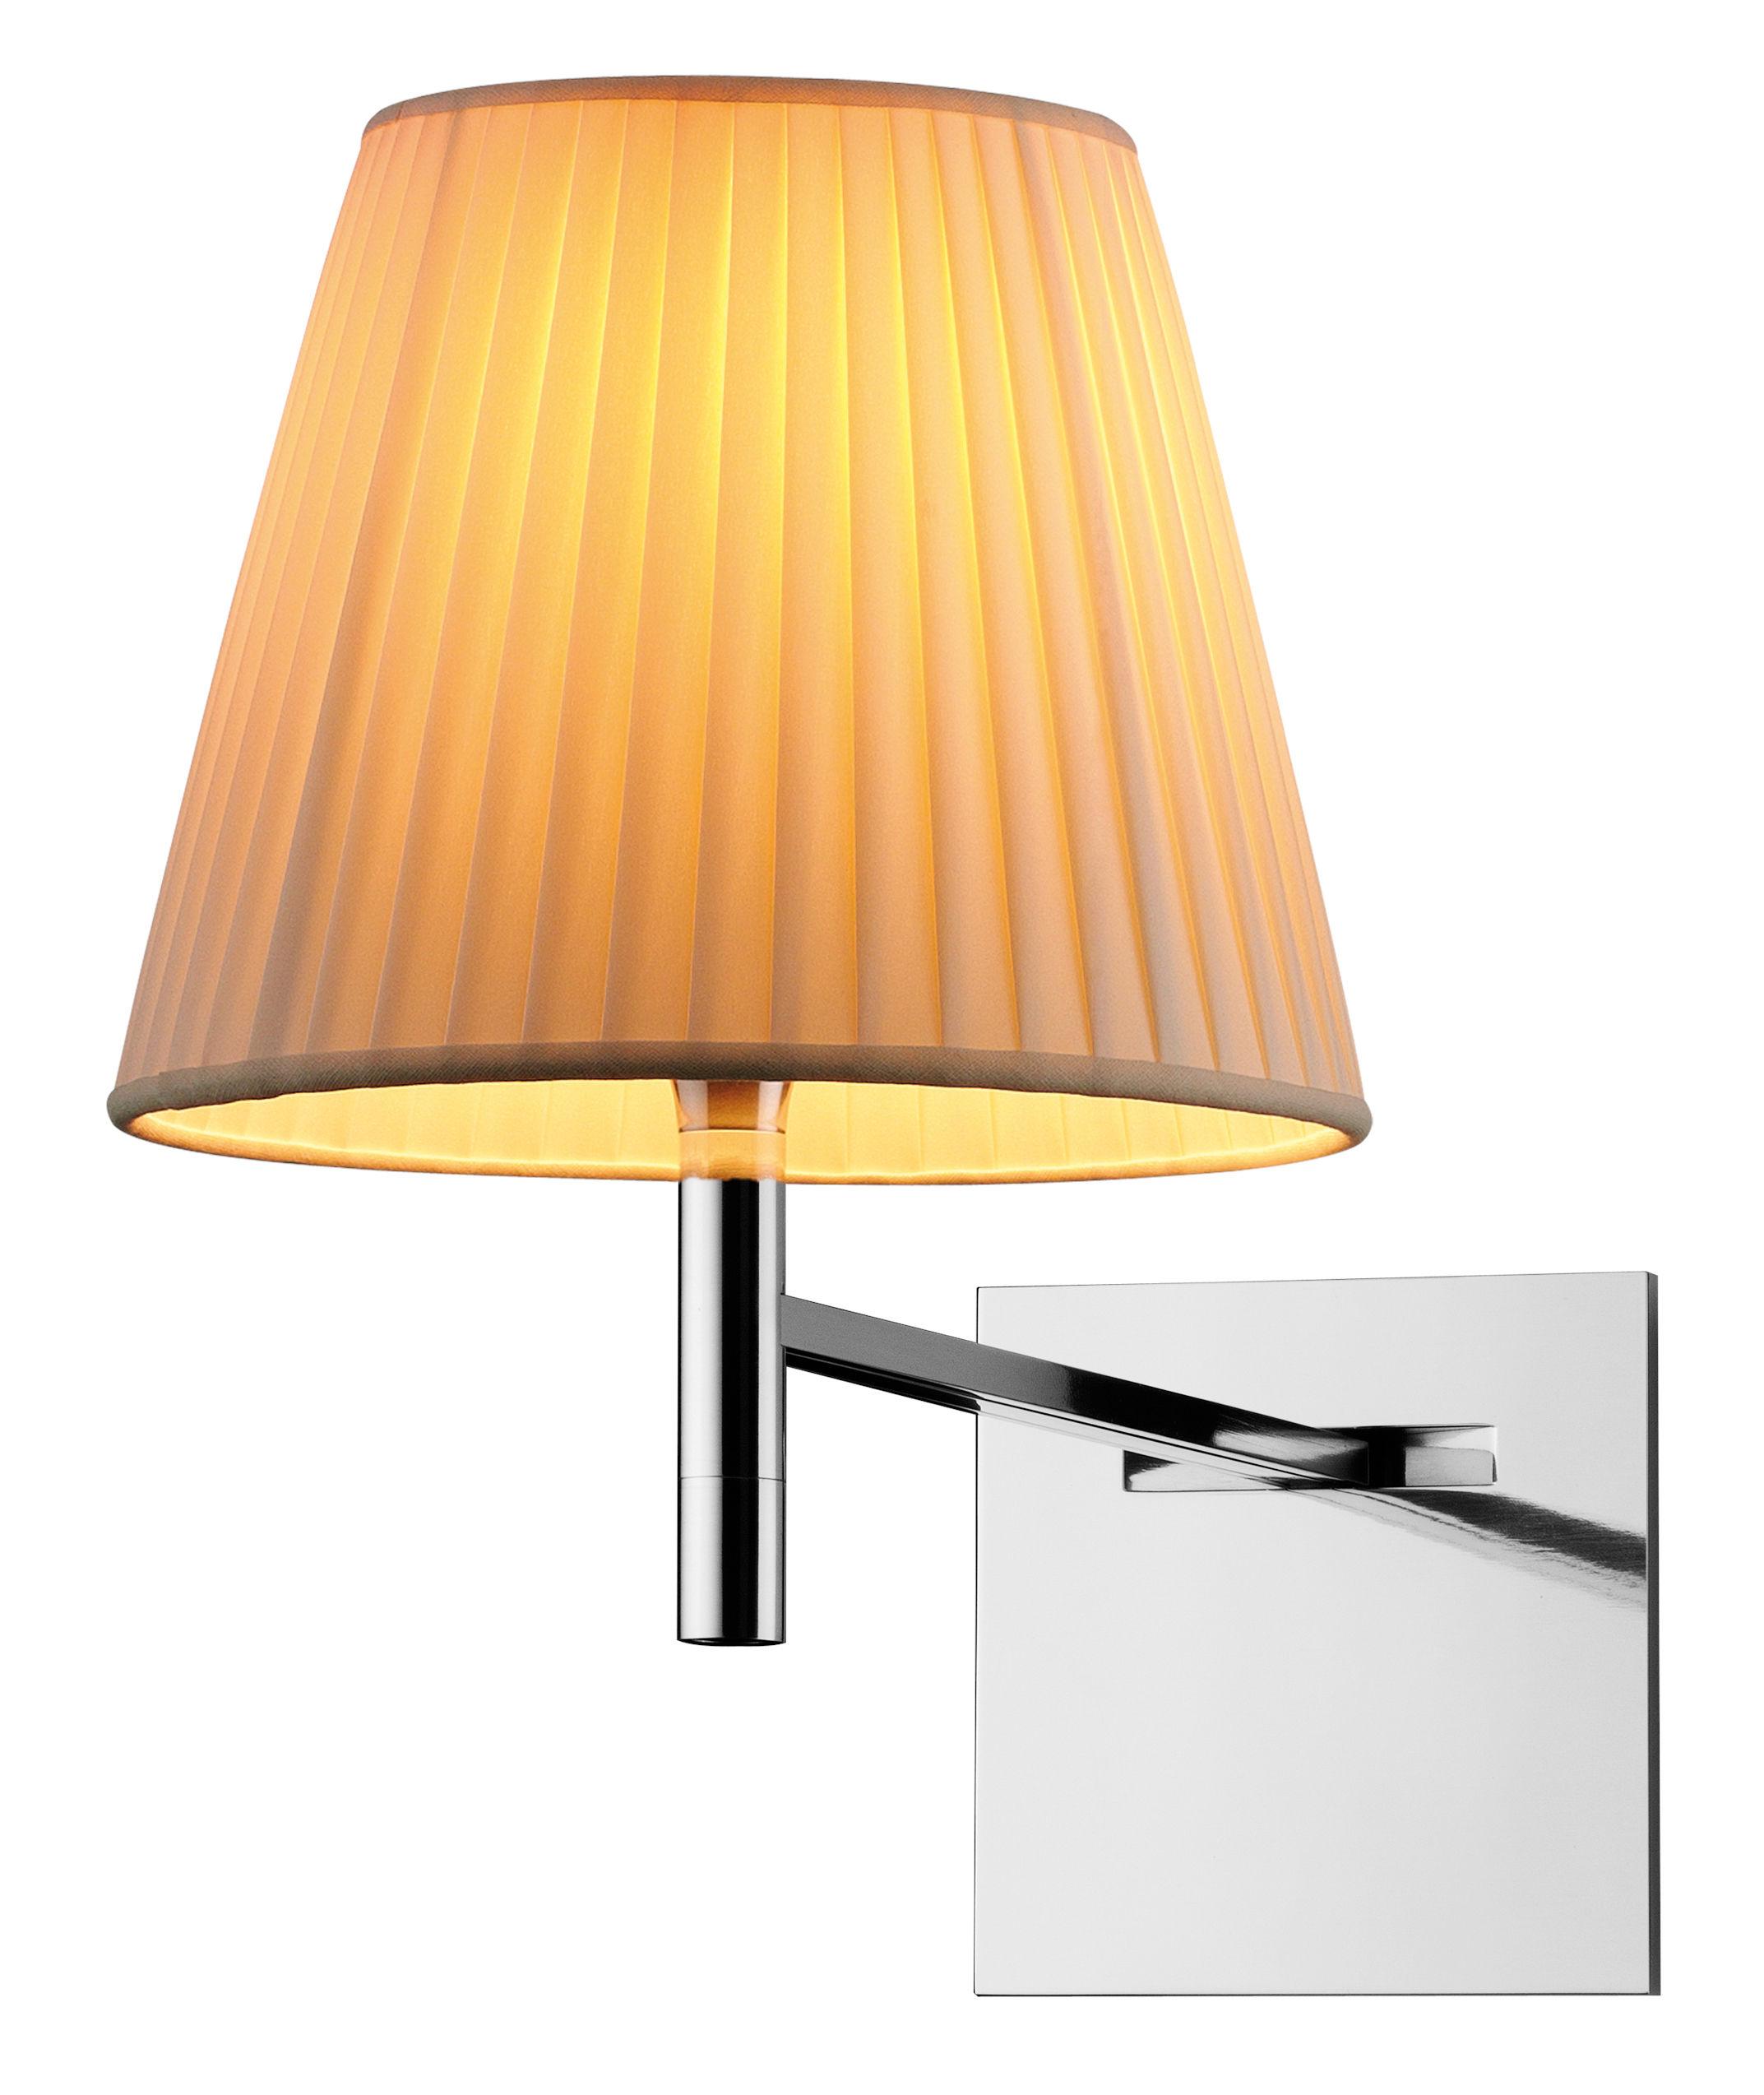 Leuchten - Wandleuchten - K Tribe W Soft Wandleuchte - Flos - Plissierter Stoff - Gewebe, poliertes Aluminium